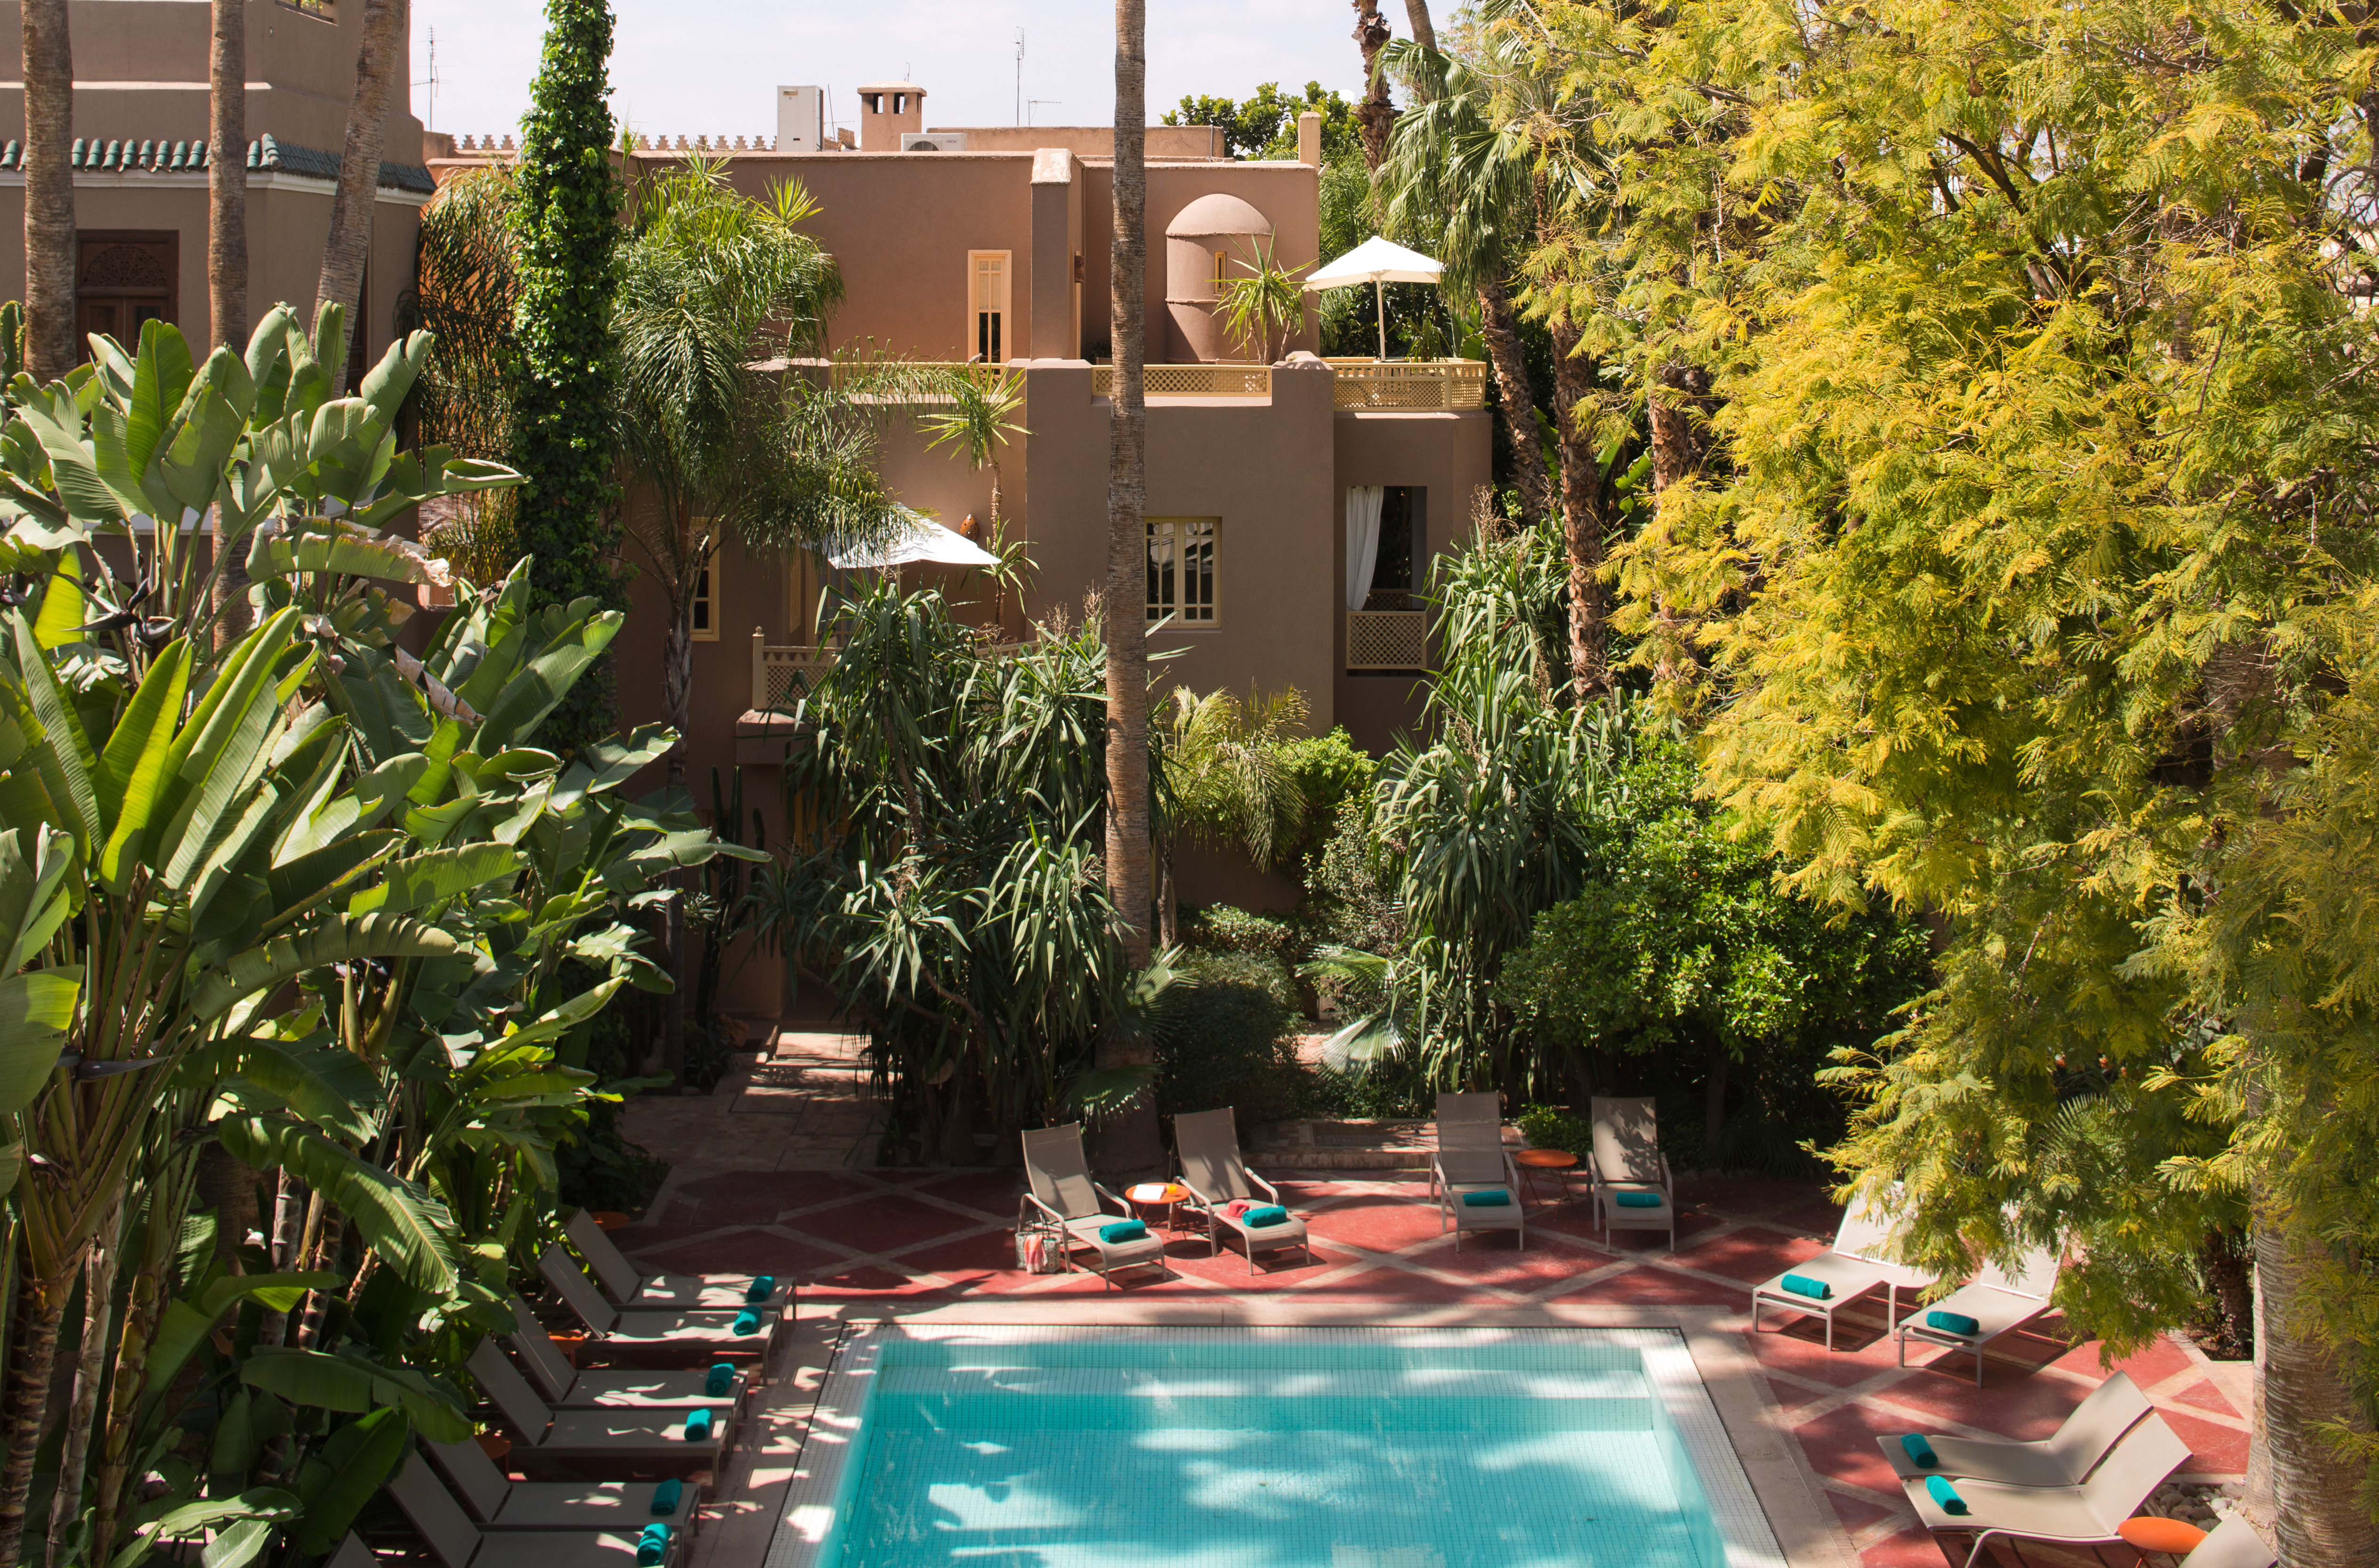 Bonne adresse Marrakech